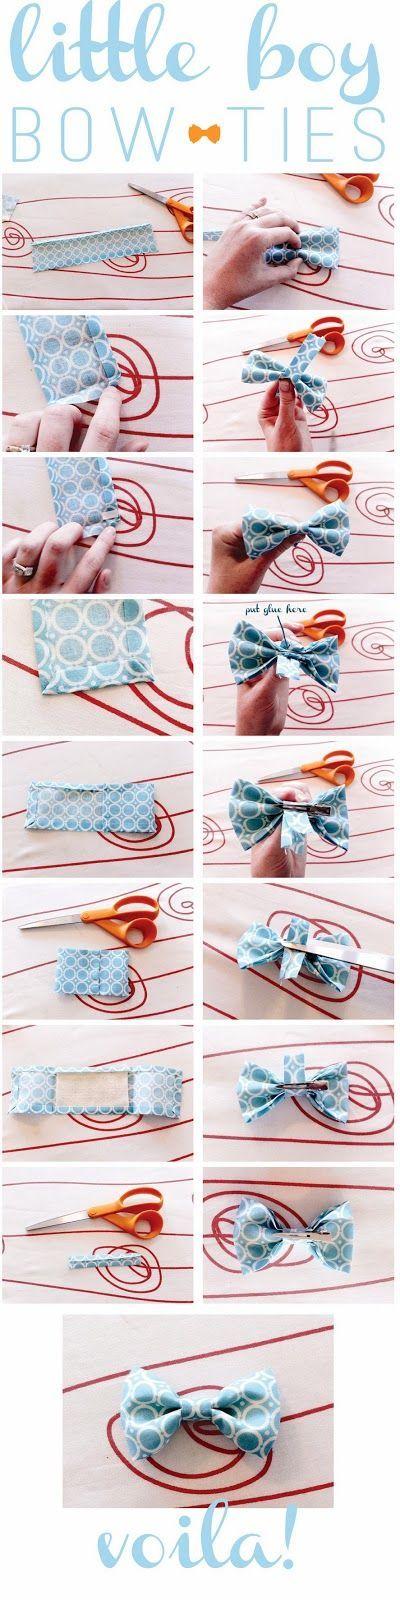 boy bowties on pinterest | Little Bow Ties for Little Boys